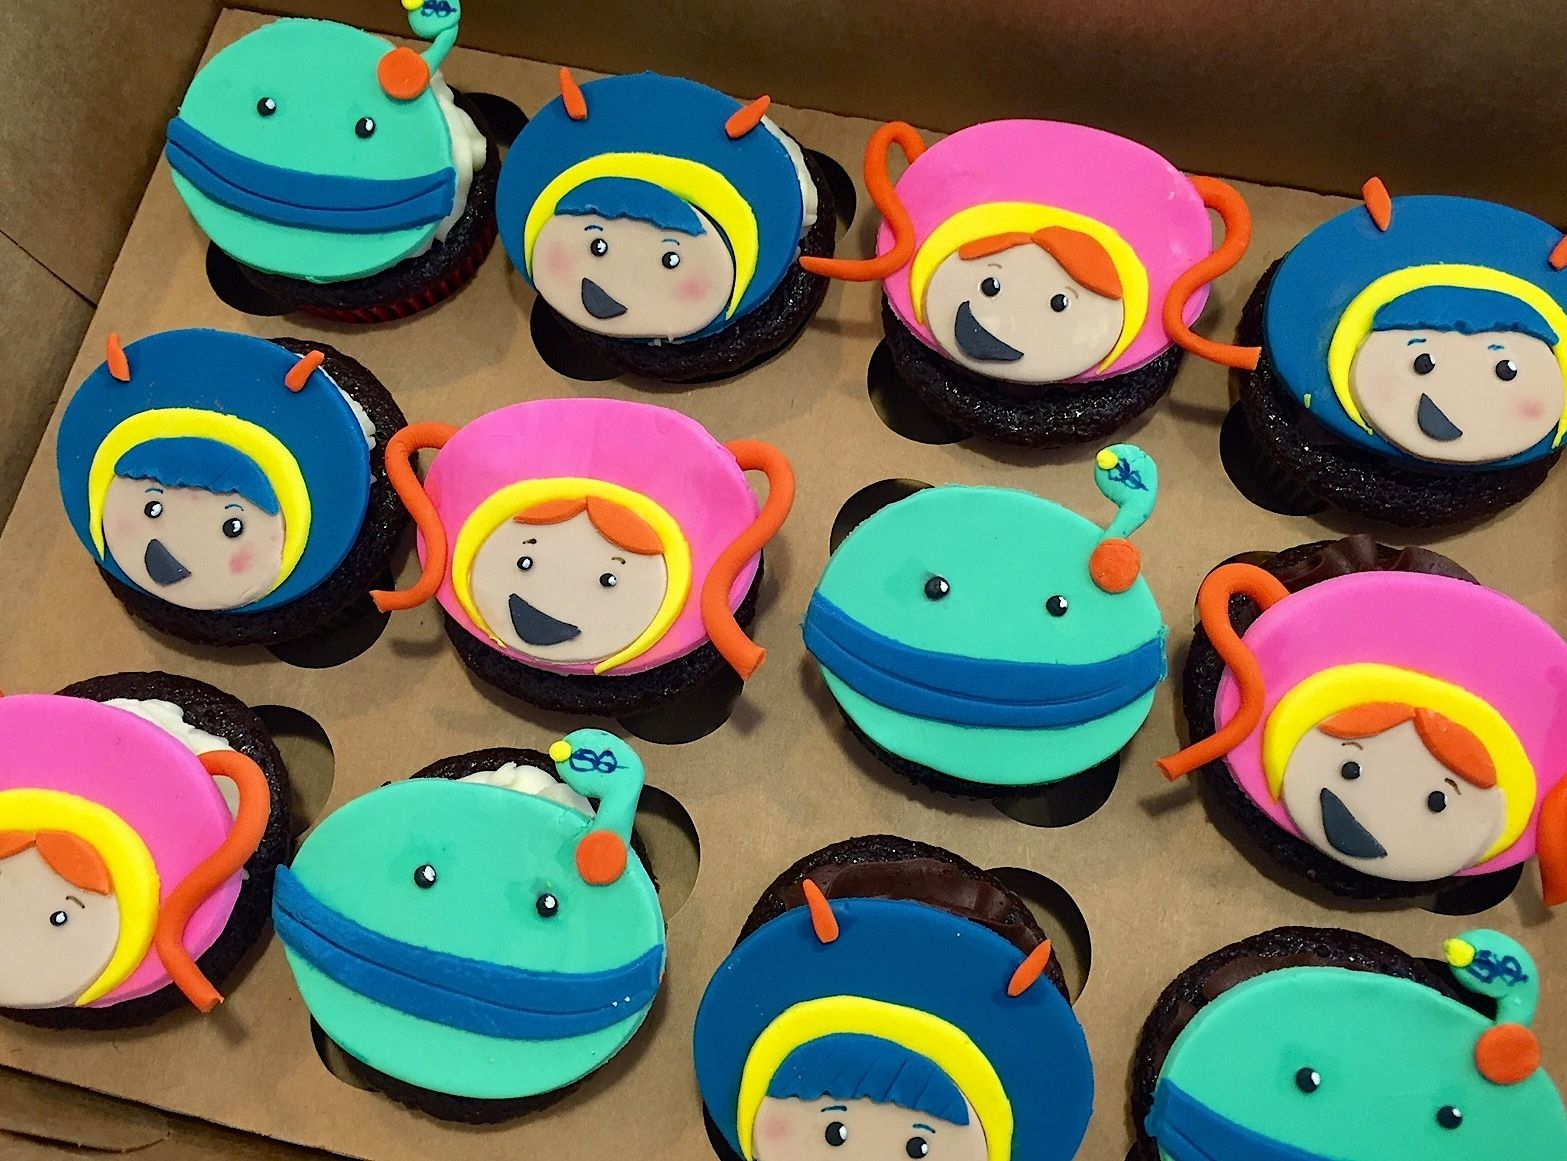 Amazing Nickjr Umizoomi Cupcakes Umizoomi Cupcakes Birthday Party Funny Birthday Cards Online Alyptdamsfinfo